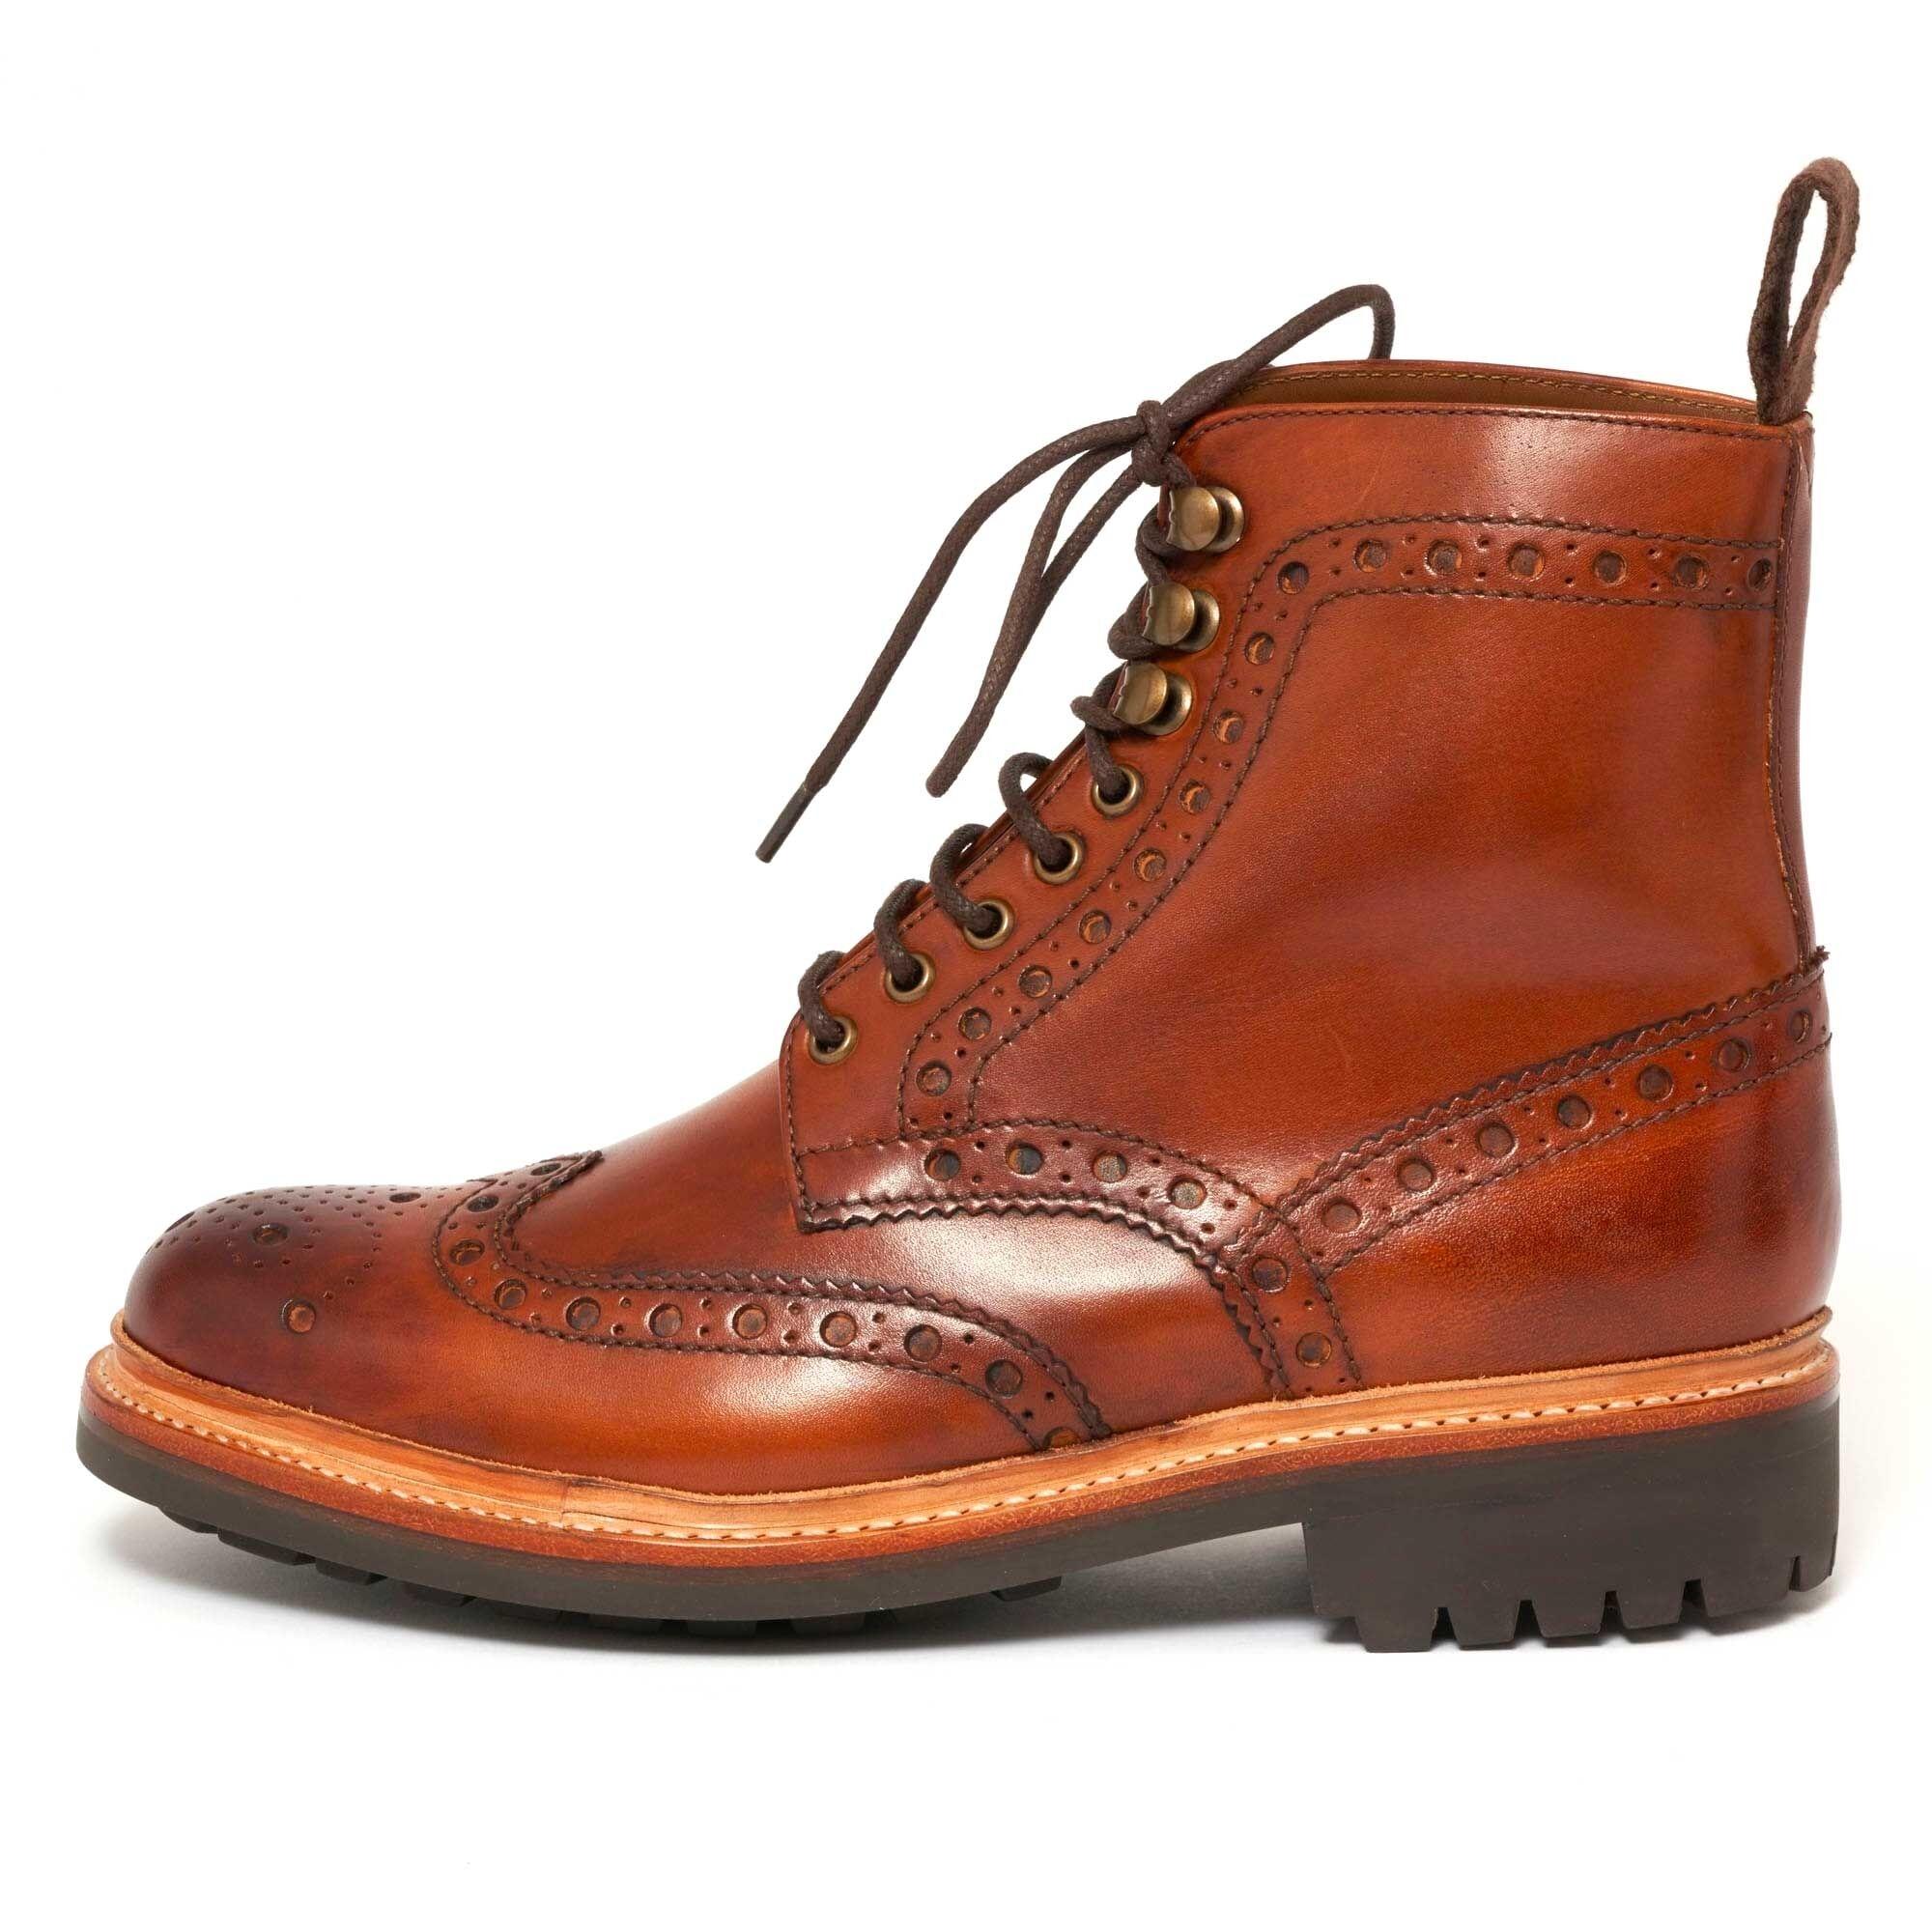 Grenson Fred Brogue Boot Tan 111394